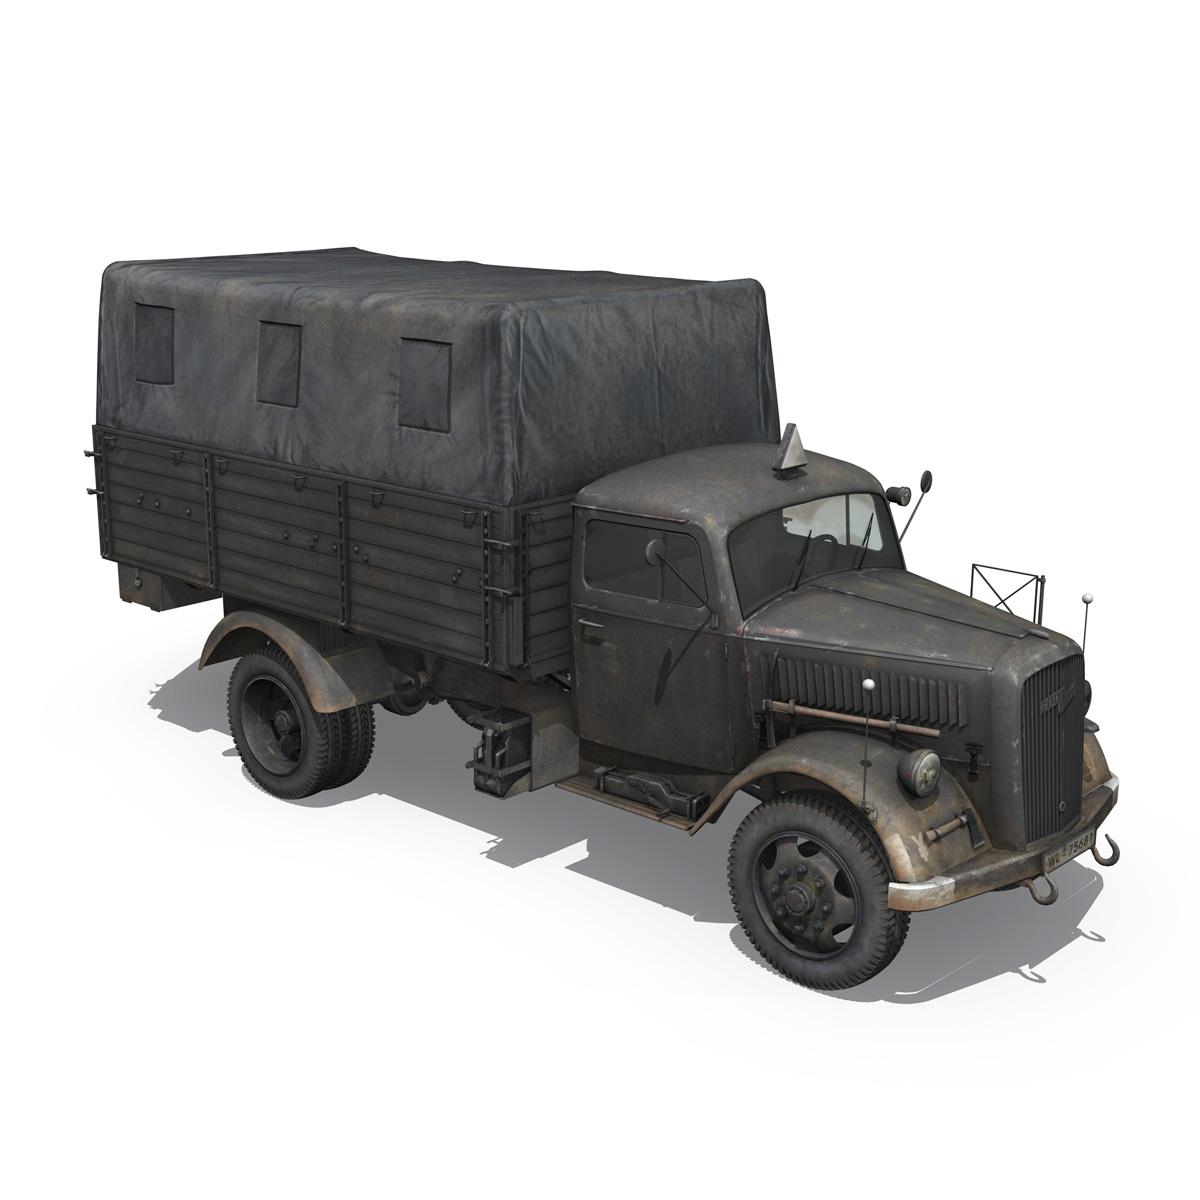 blitz opel - lori cargo 3t - 17 pzdiv model 3d 3ds fbx c4d lwo obj 197201